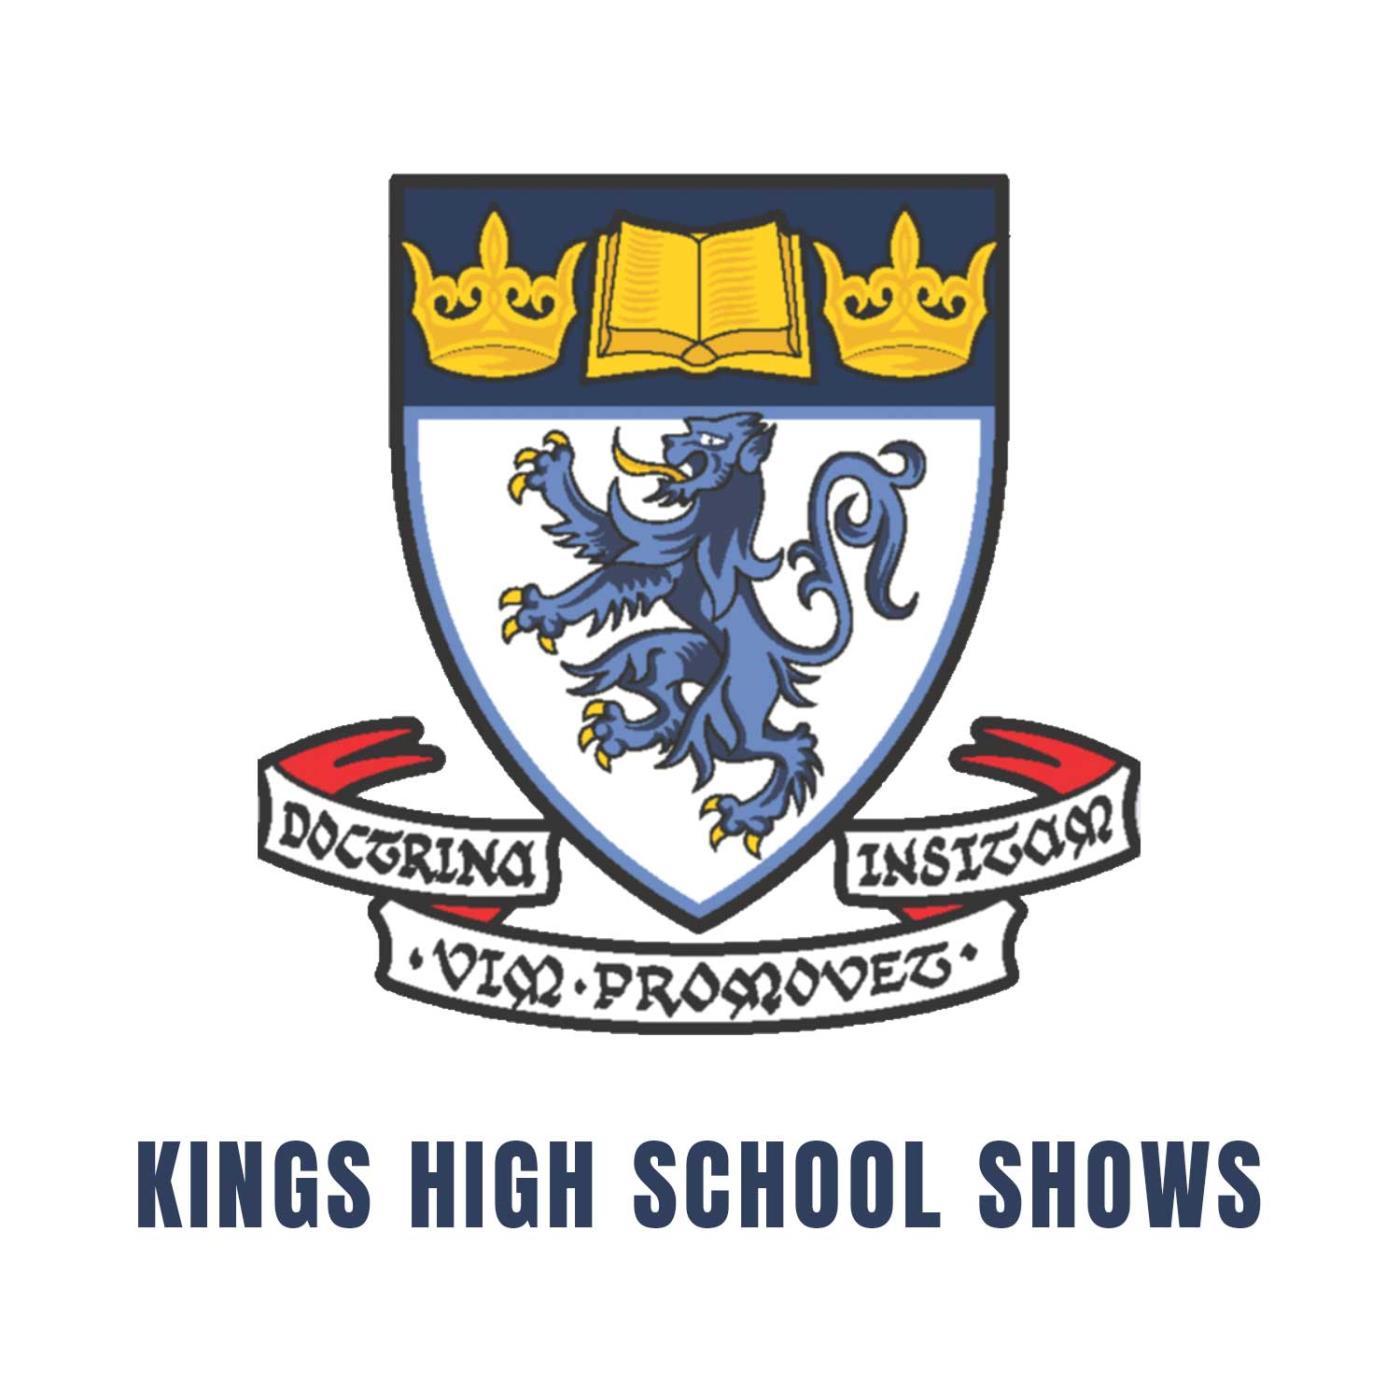 Kings High School Shows - 12-08-2020 - Under Pressure - Mason